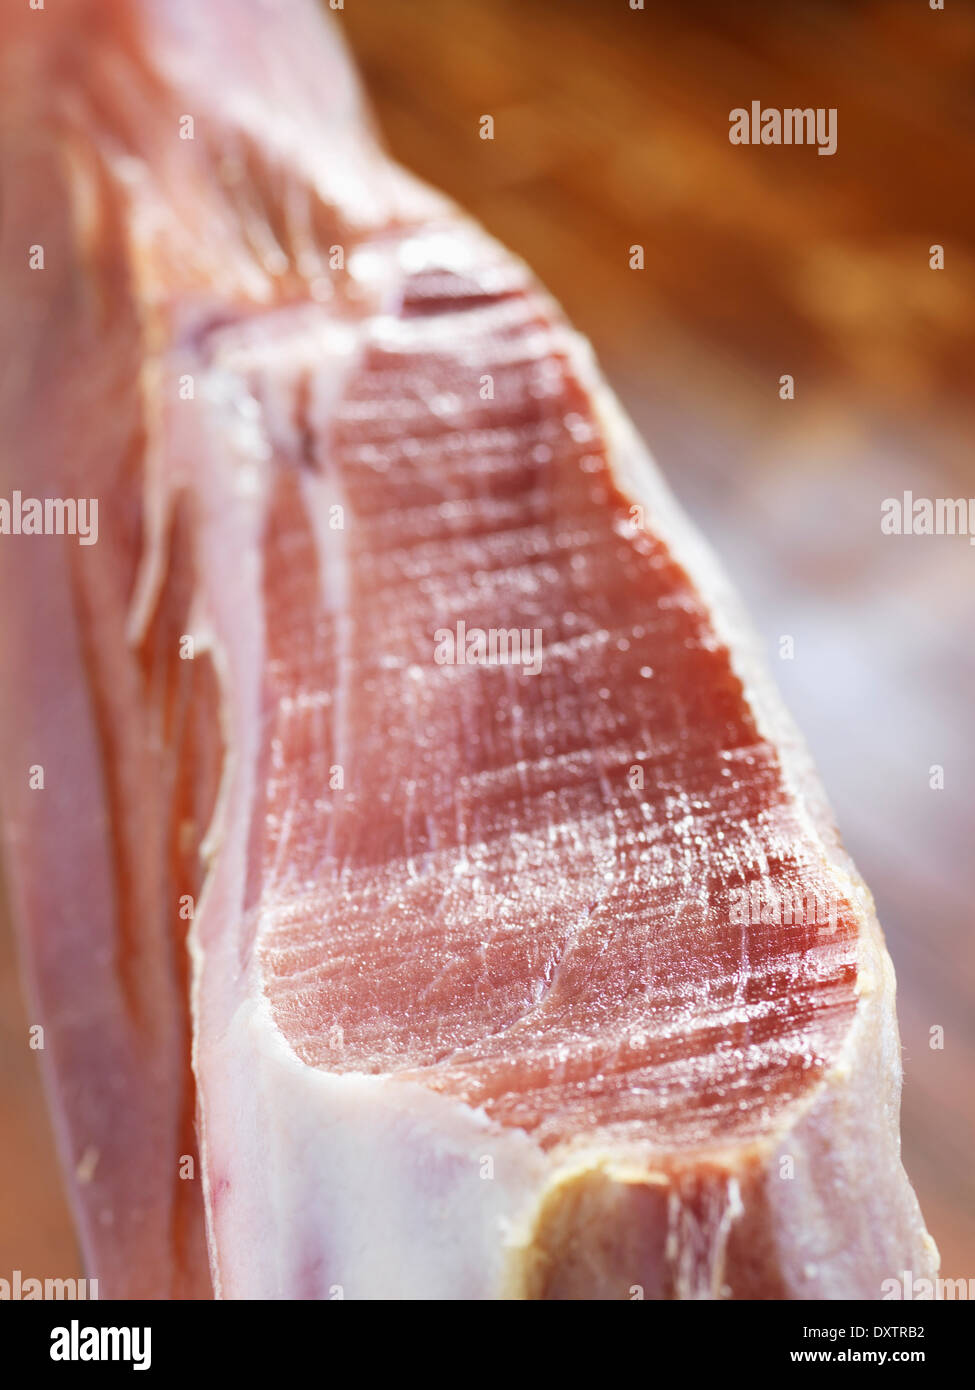 Serrano ham - Stock Image